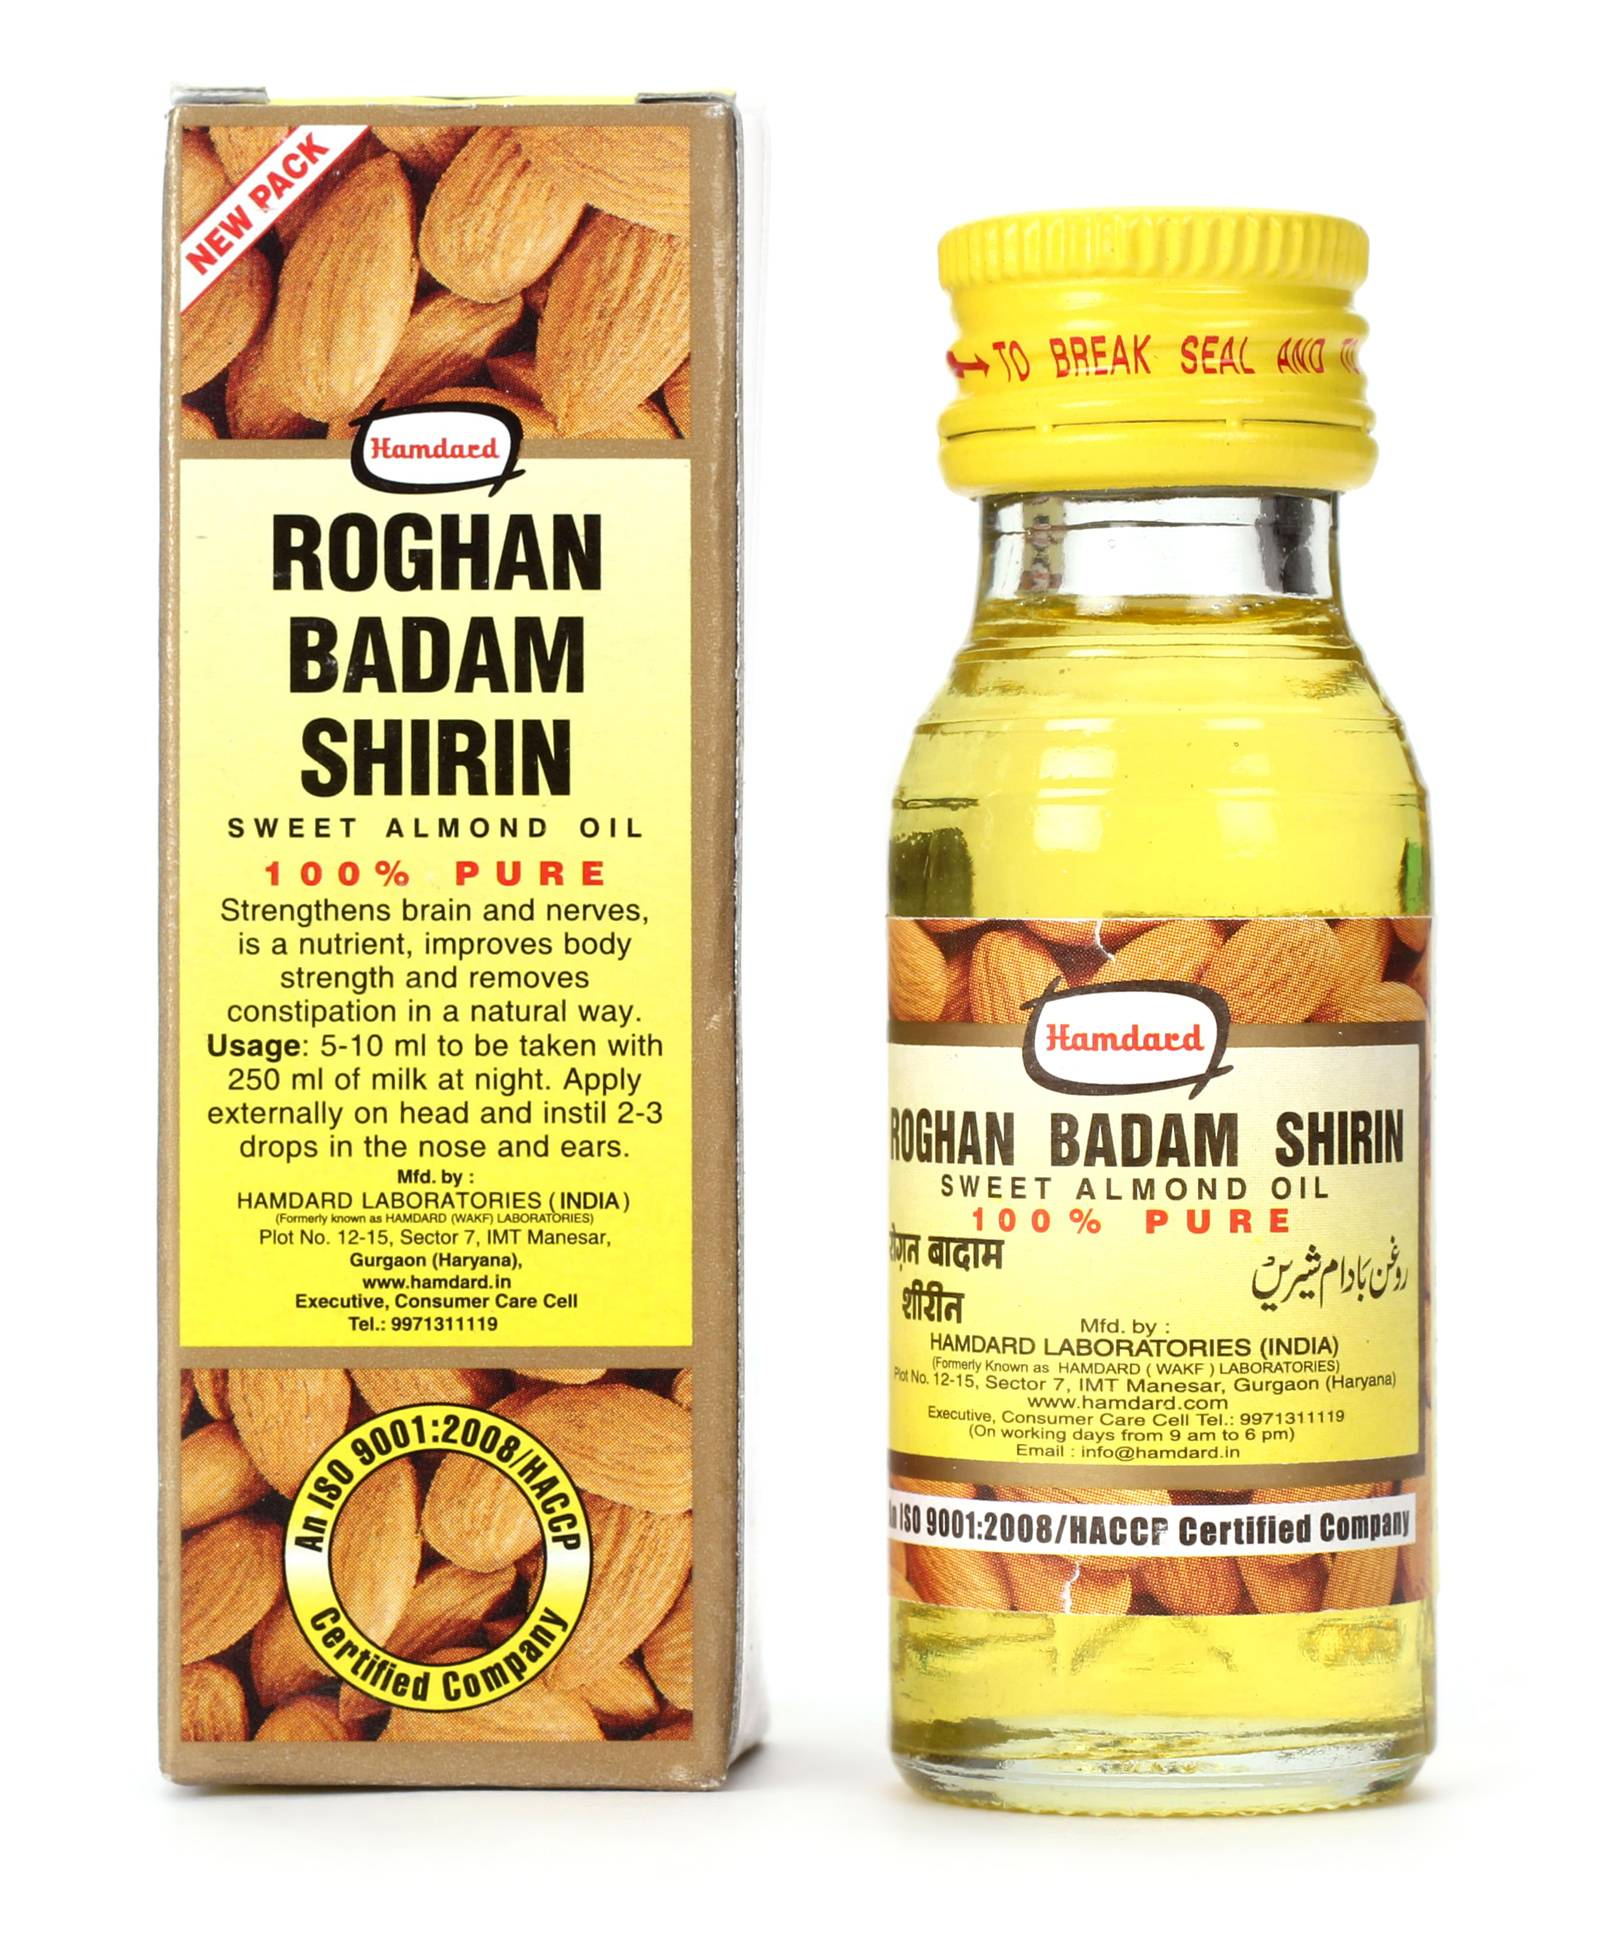 Hamdard Roghan Badam Shirin Sweet Almond Oil Image